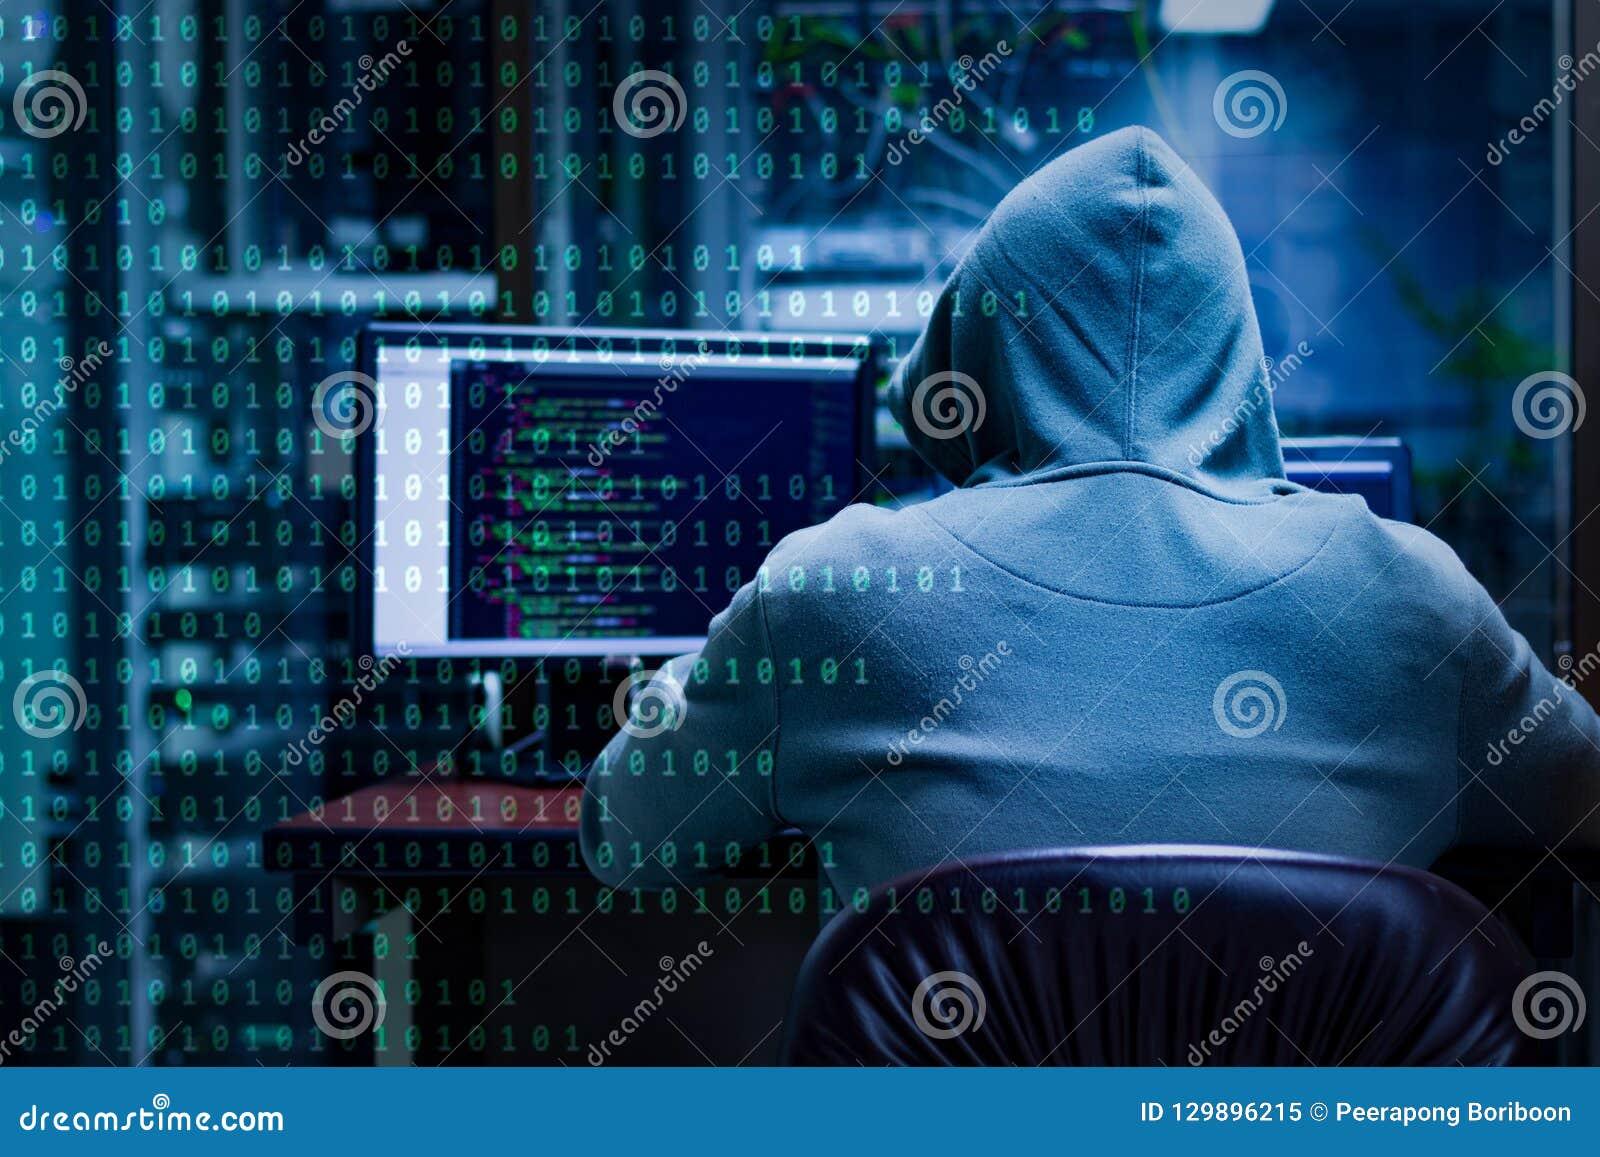 Zero one hacker coding